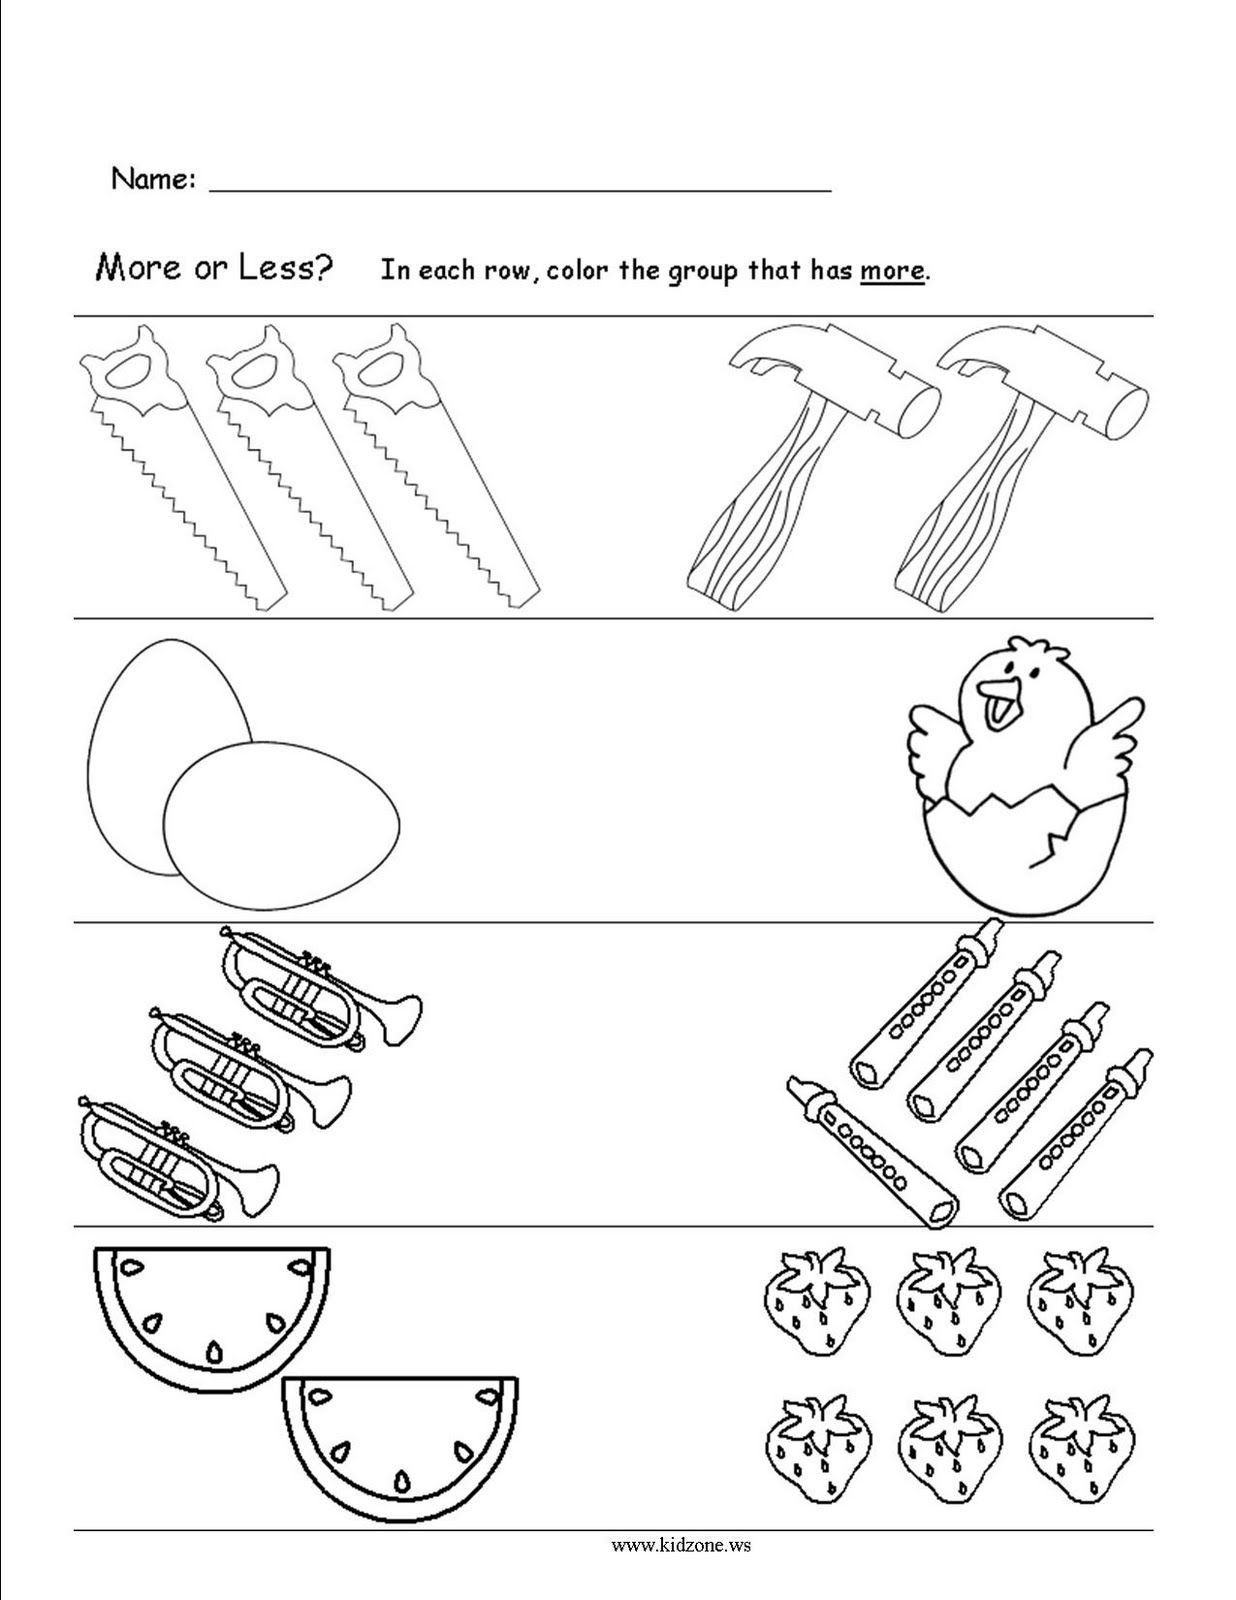 Categorizing Worksheets For Kindergarten In 2020 More And Less Preschool Worksheets Kindergarten Worksheets Printable [ 1600 x 1236 Pixel ]